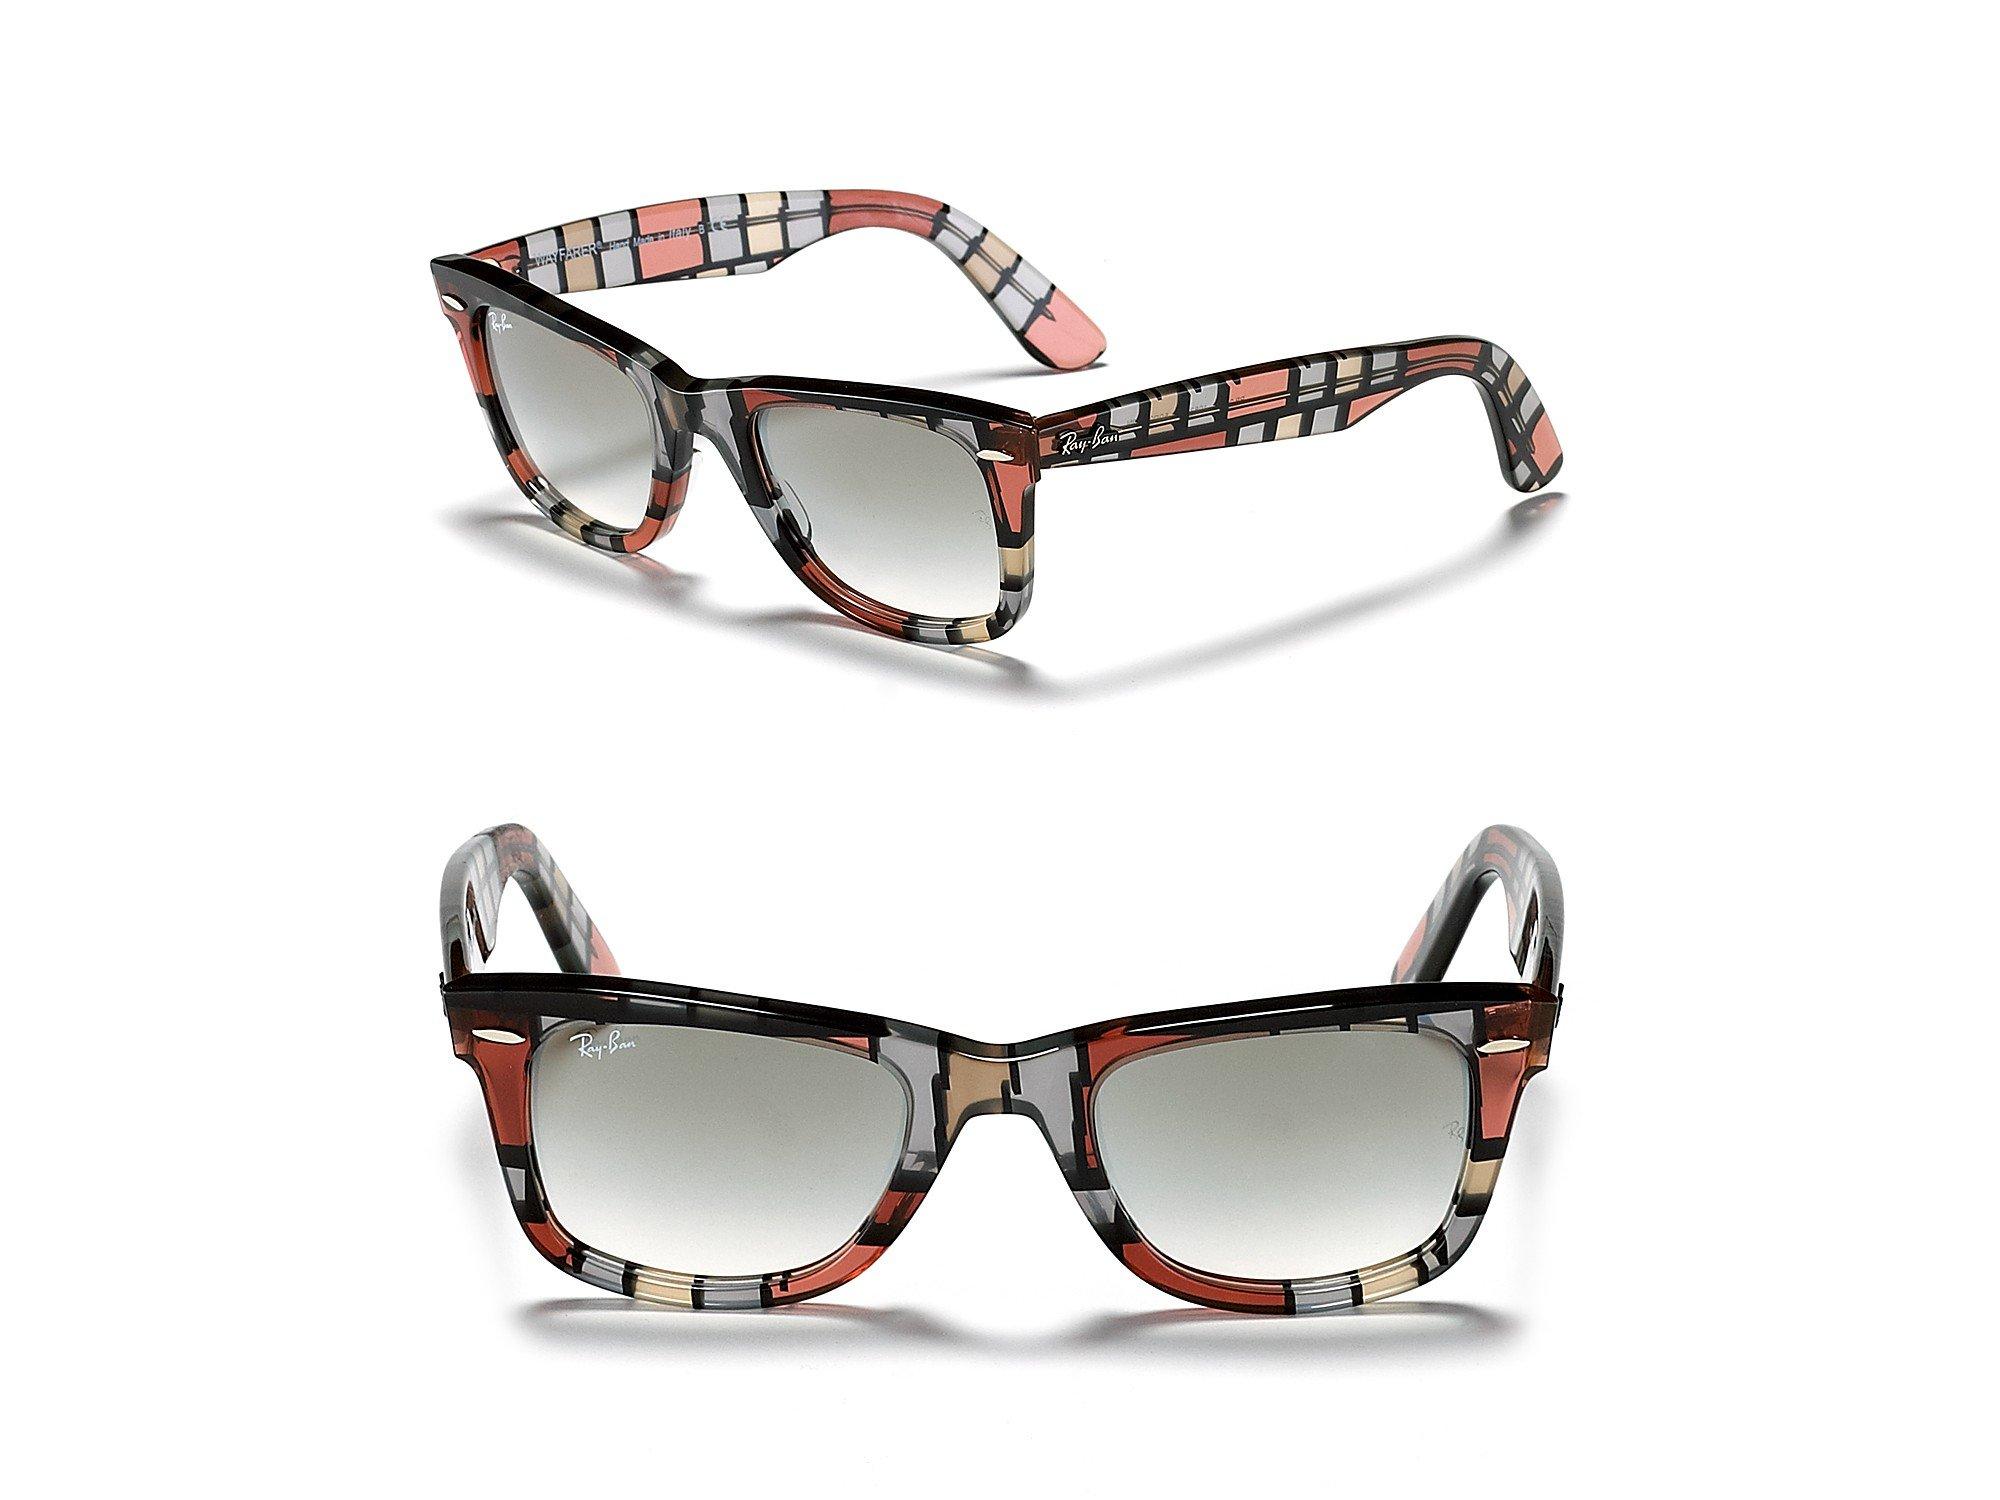 ray ban classic wayfarer sunglasses sale  gallery. previously sold at: bloomingdale's · men's wayfarer sunglasses